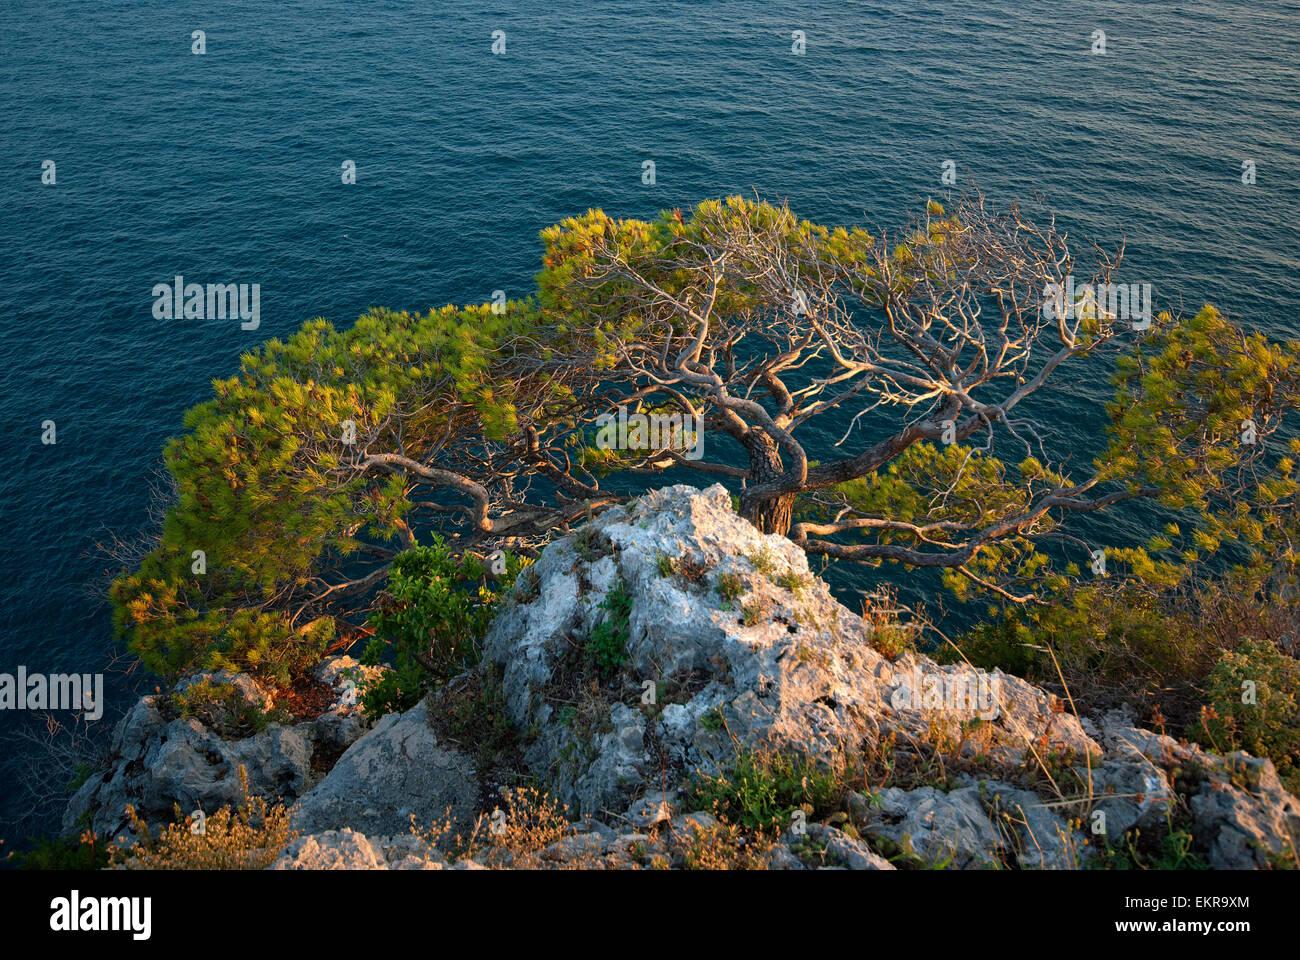 Pino d'Aleppo, aleppo pine (Pinus halepensis), Mount Orlando Regional Park, Gaeta, Lazio, Italy - Stock Image